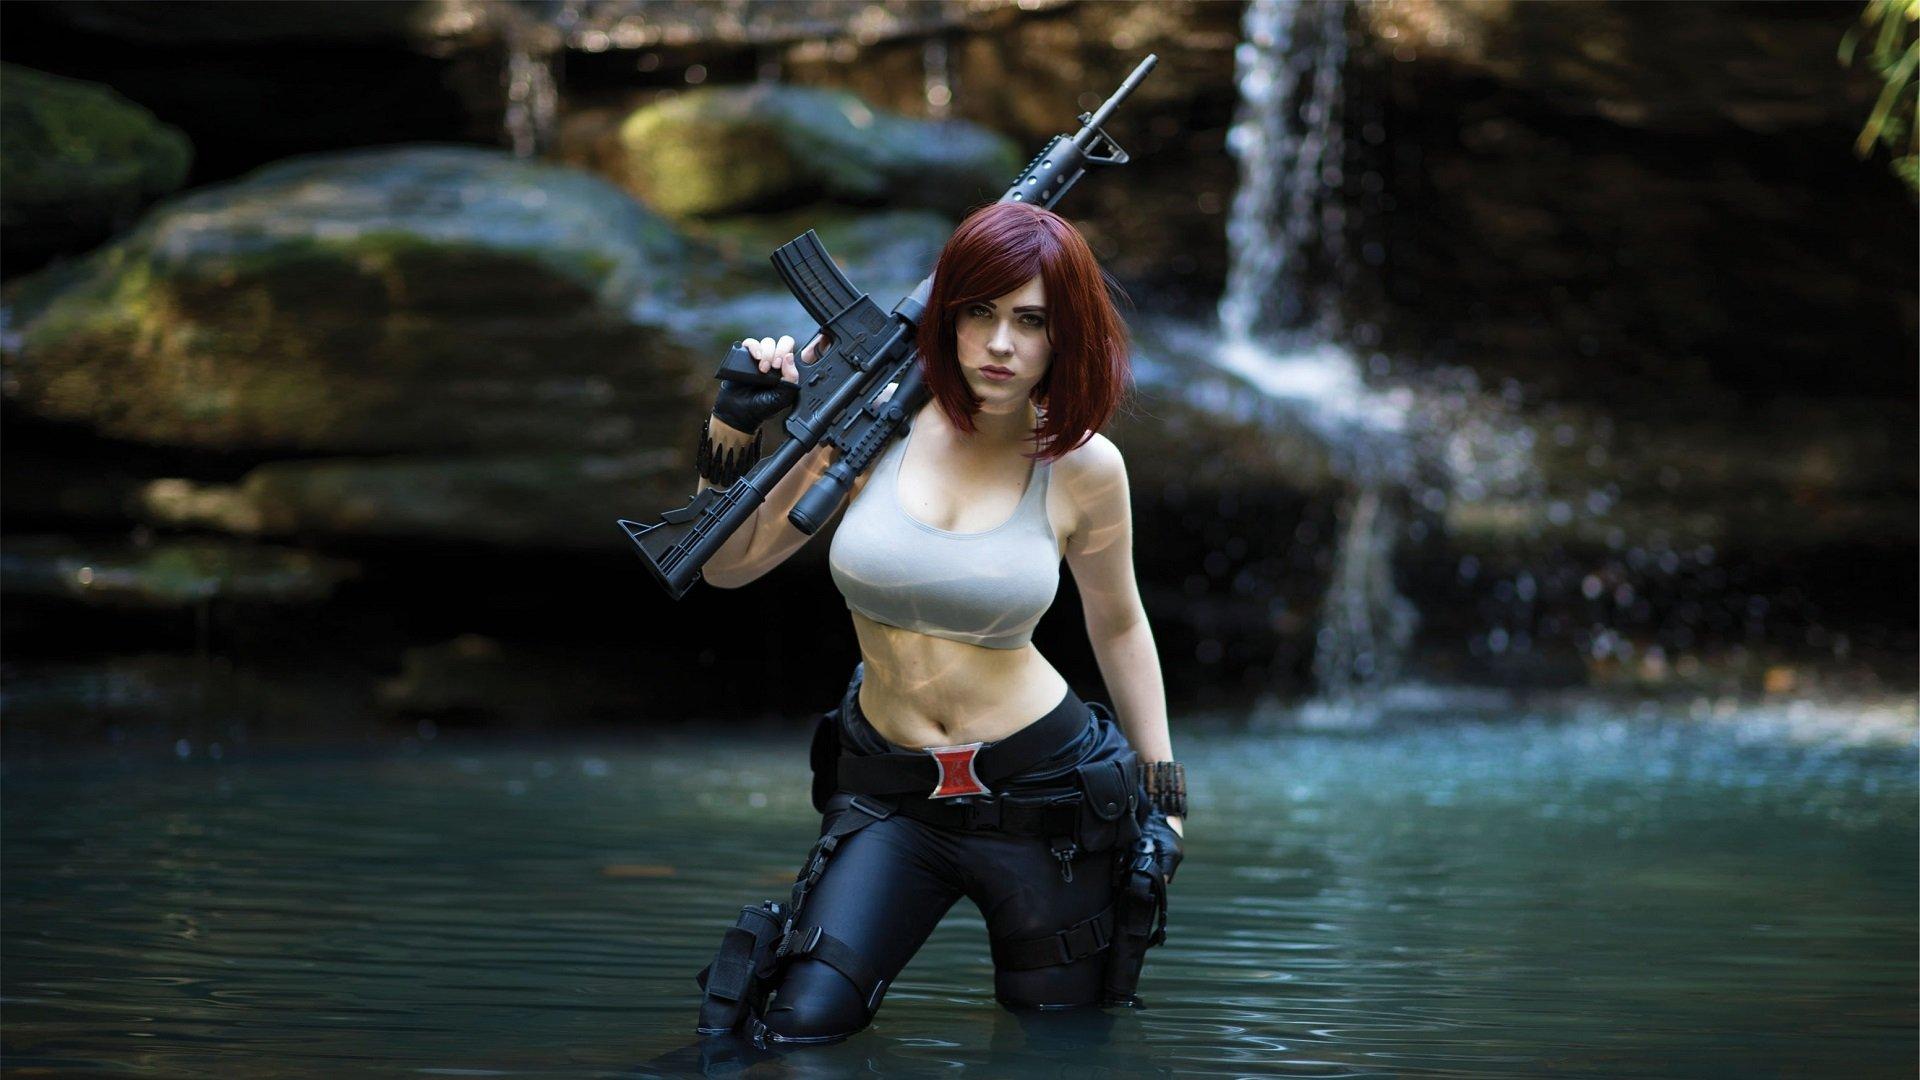 cosplay 1920x1080 image -#main